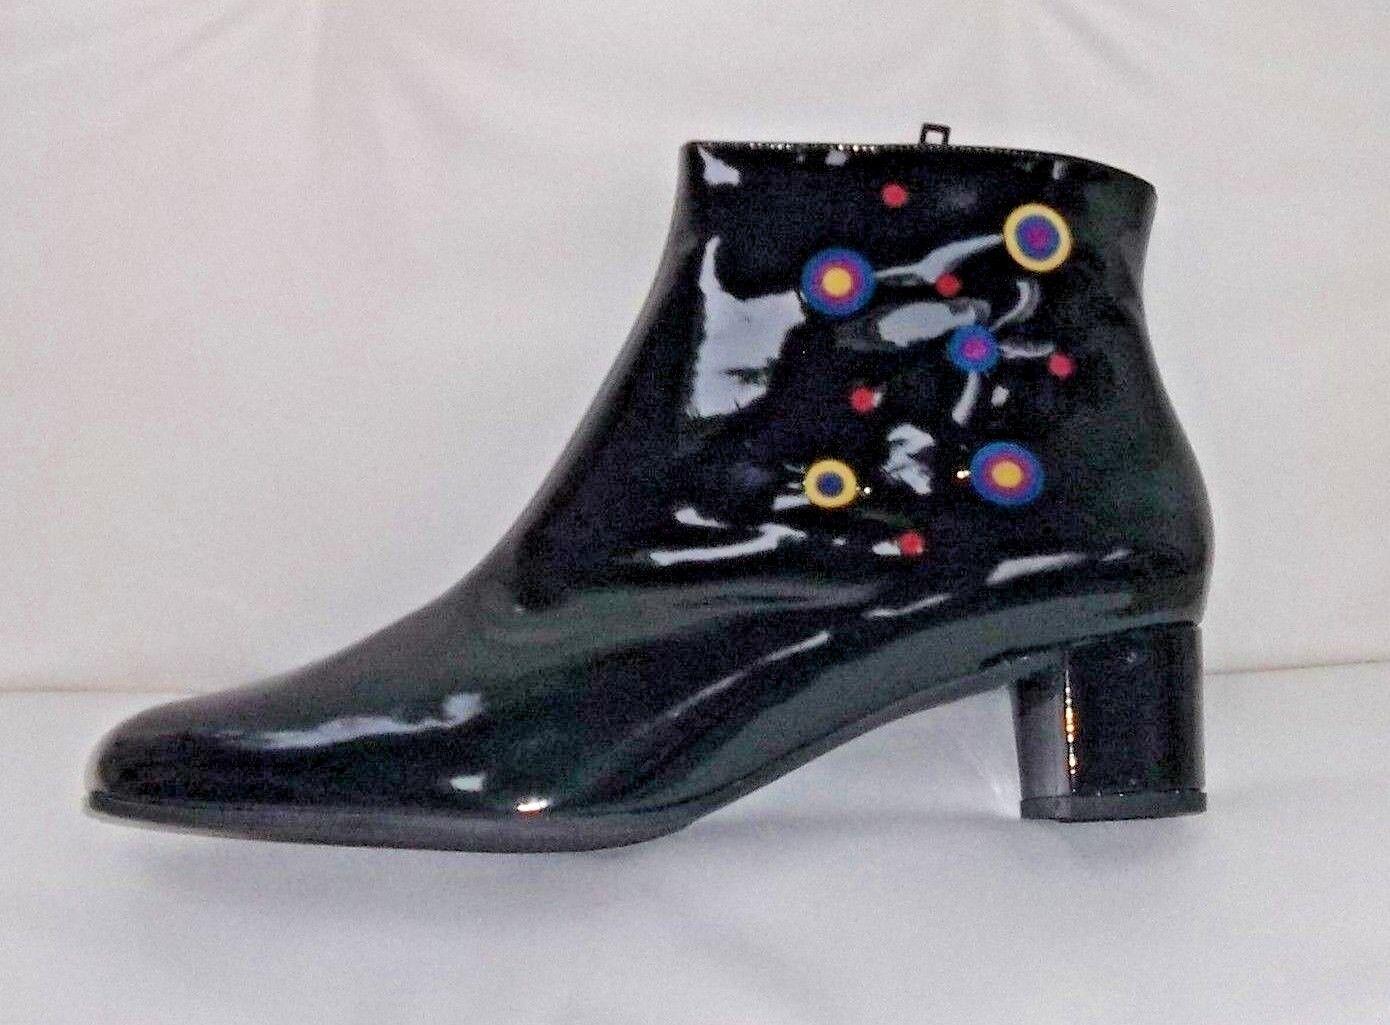 AZUREE Noir MultiCouleure bottines vernies à, UK 8 EU 41   BNWB